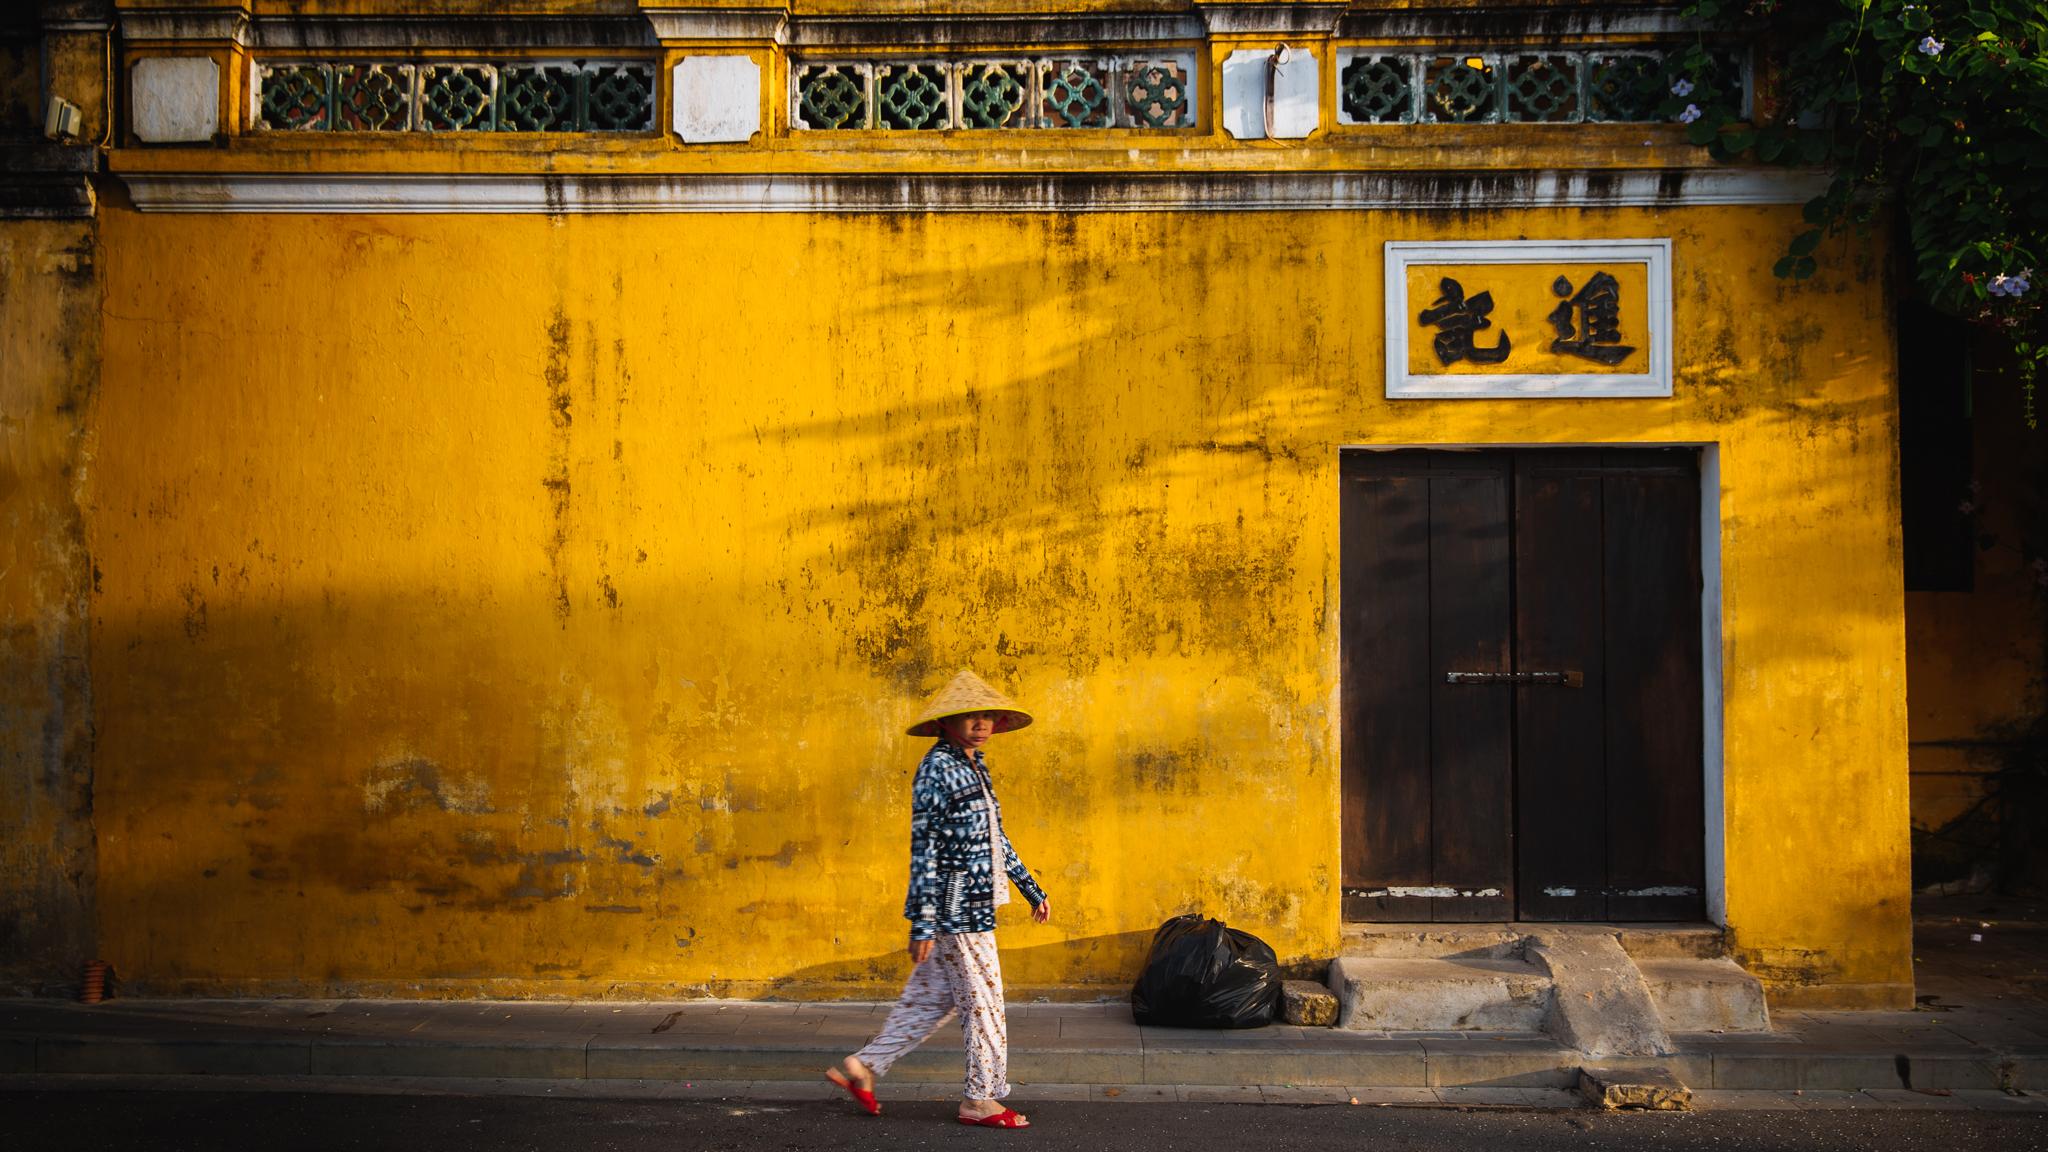 VIETNAM - more photos coming soon...